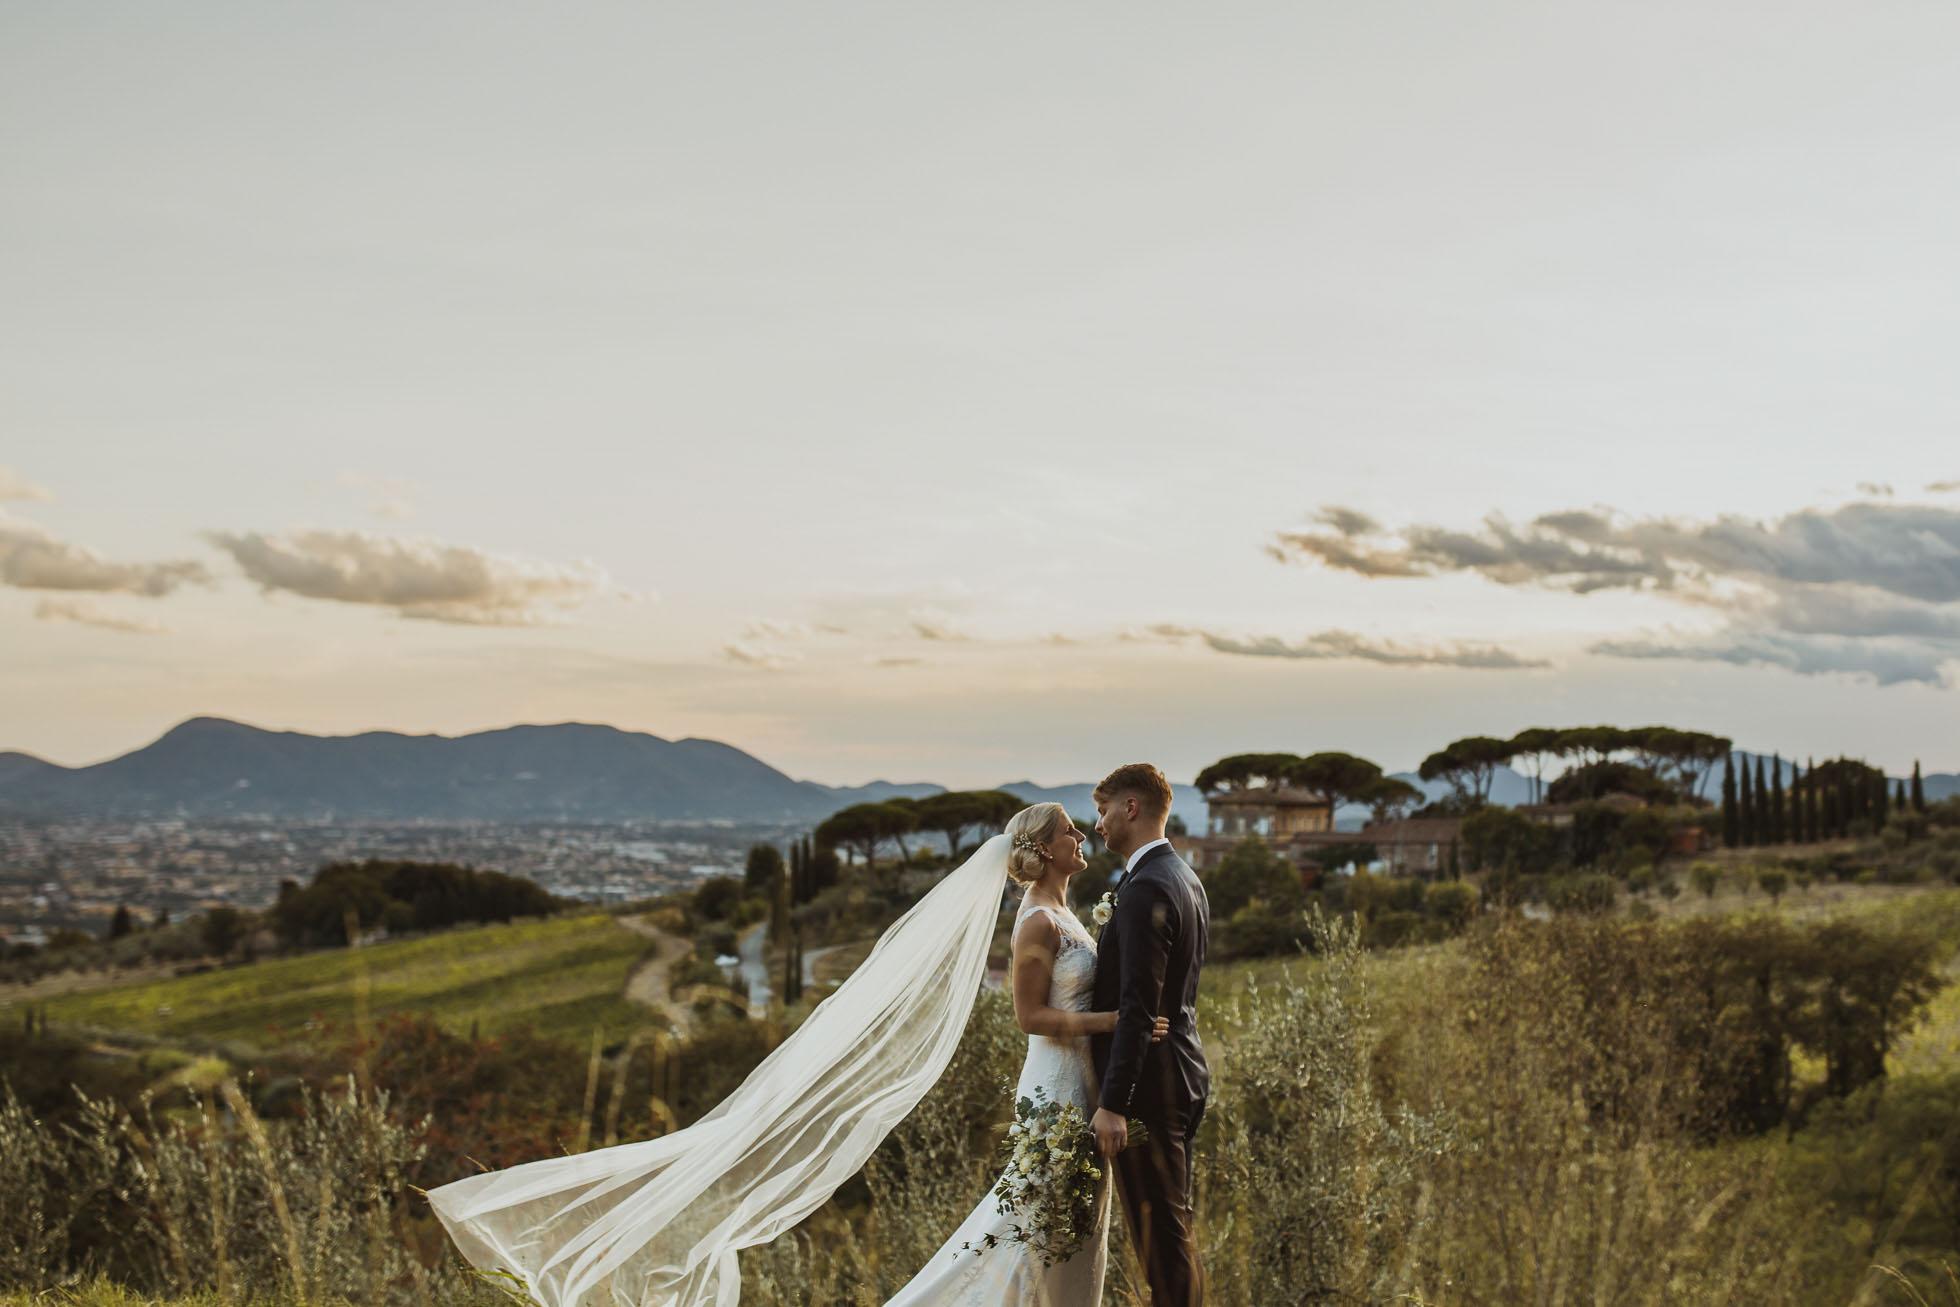 tenuta_san_pietro_wedding_photographer-70.jpg